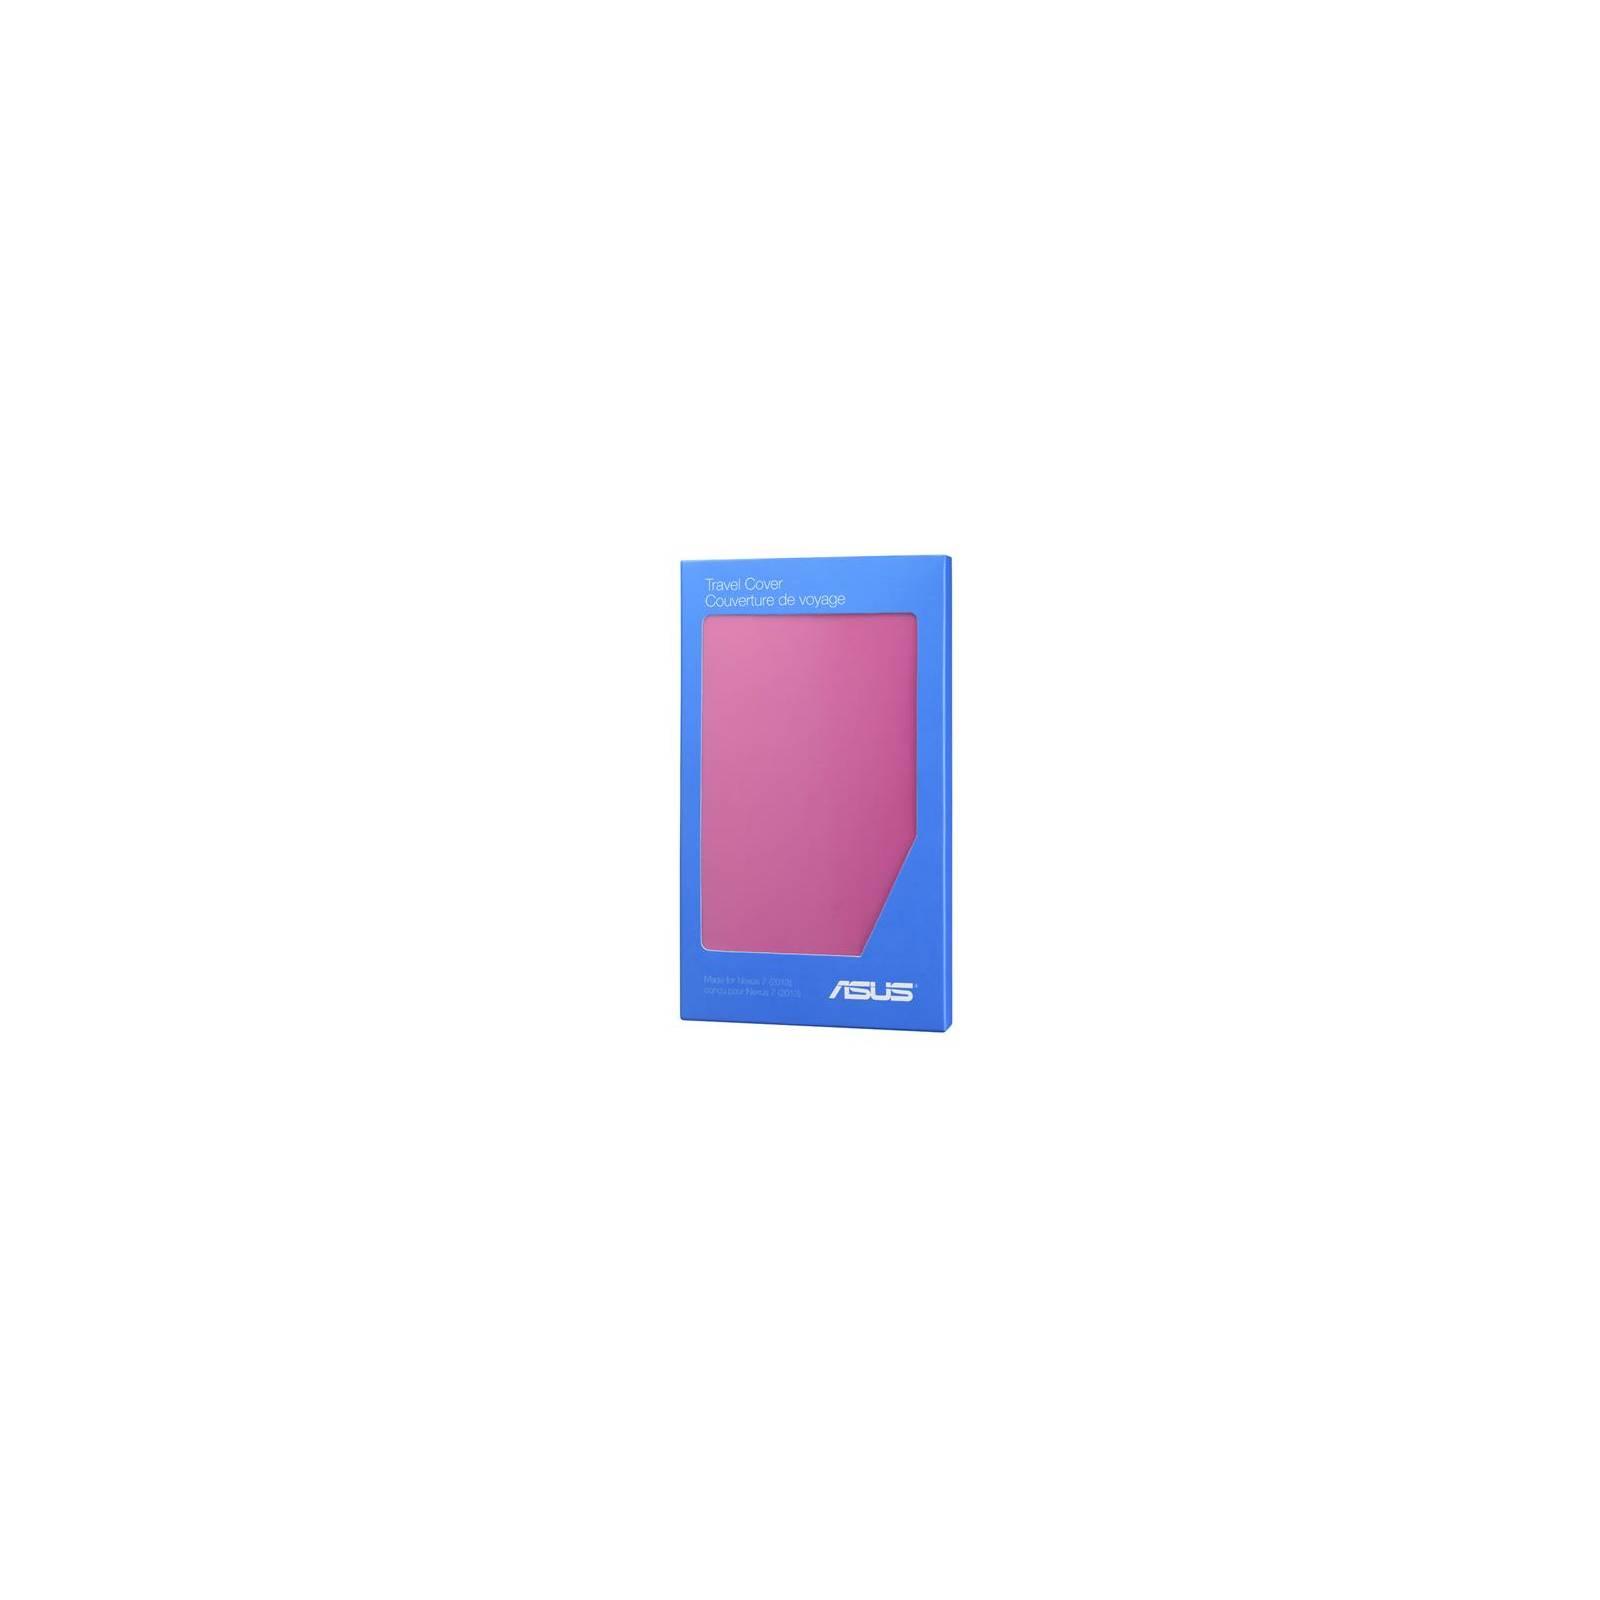 Чехол для планшета ASUS Nexus 7 2013 TRAVEL COVER V2 PINK (90-XB3TOKSL001P0-) изображение 7